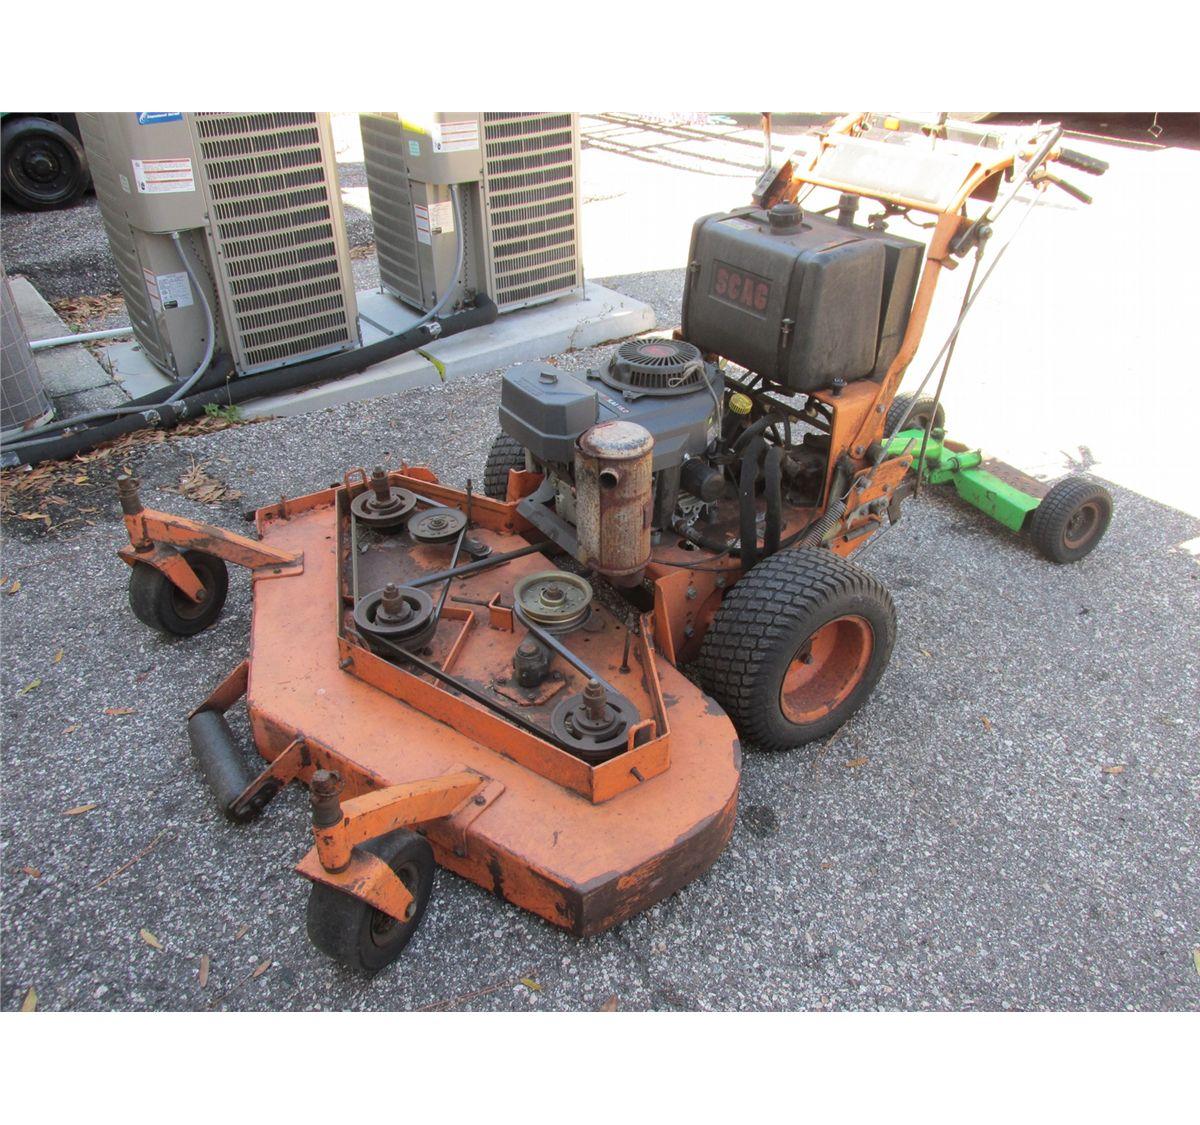 Scag walk-behind mower, sulky, 2 yr  old Kawasaki engine, 52